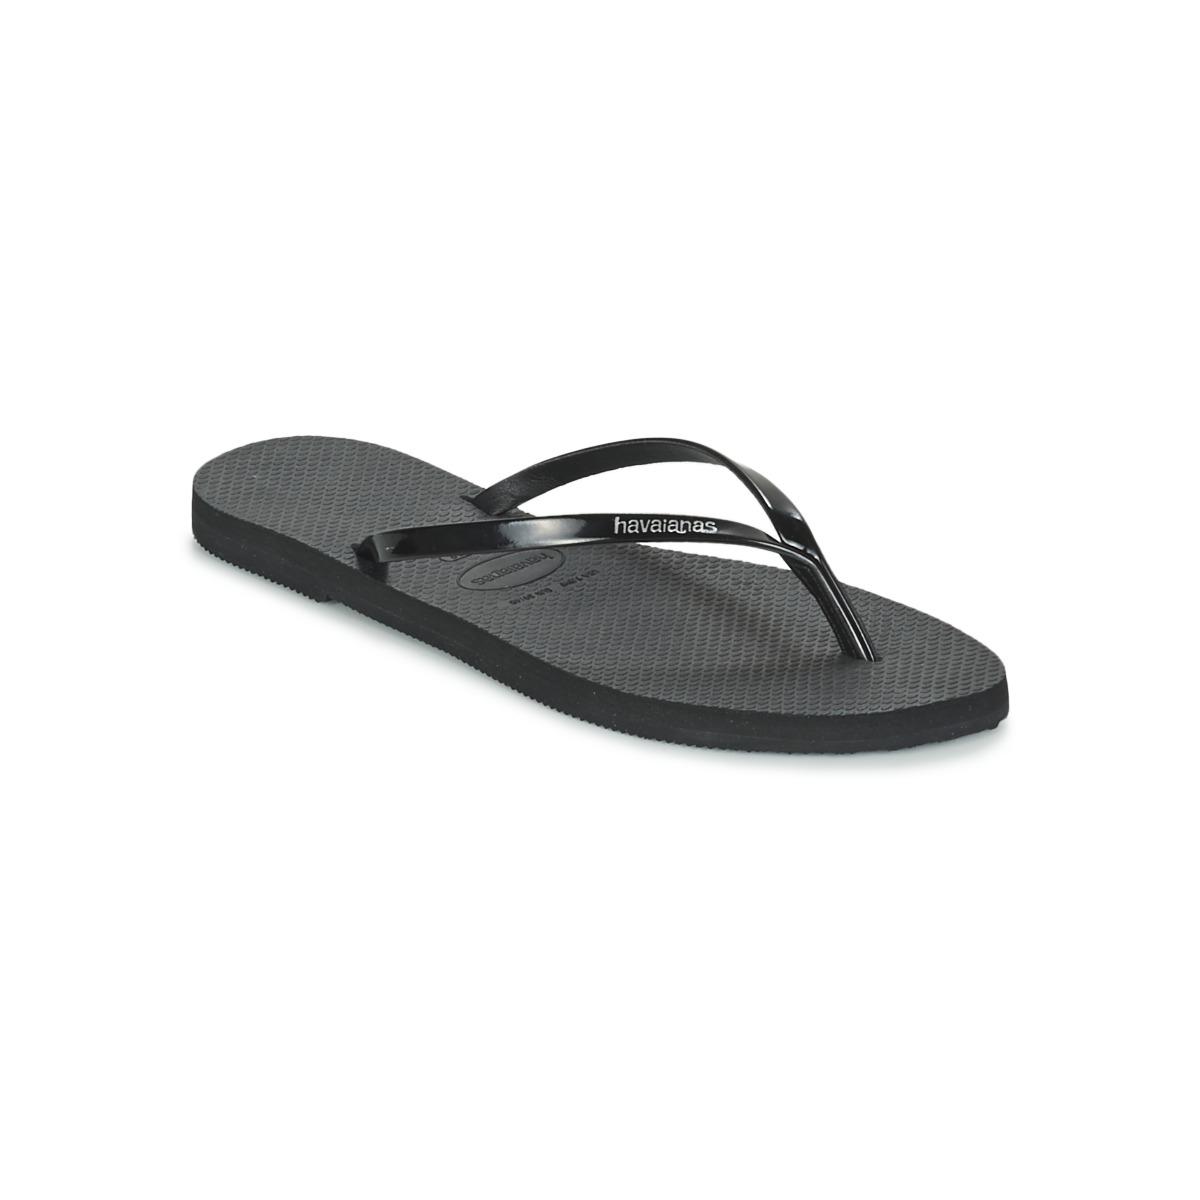 Havaianas YOU METALLIC Schwarz - Kostenloser Versand bei Spartoode ! - Schuhe Zehensandalen Damen 29,99 €